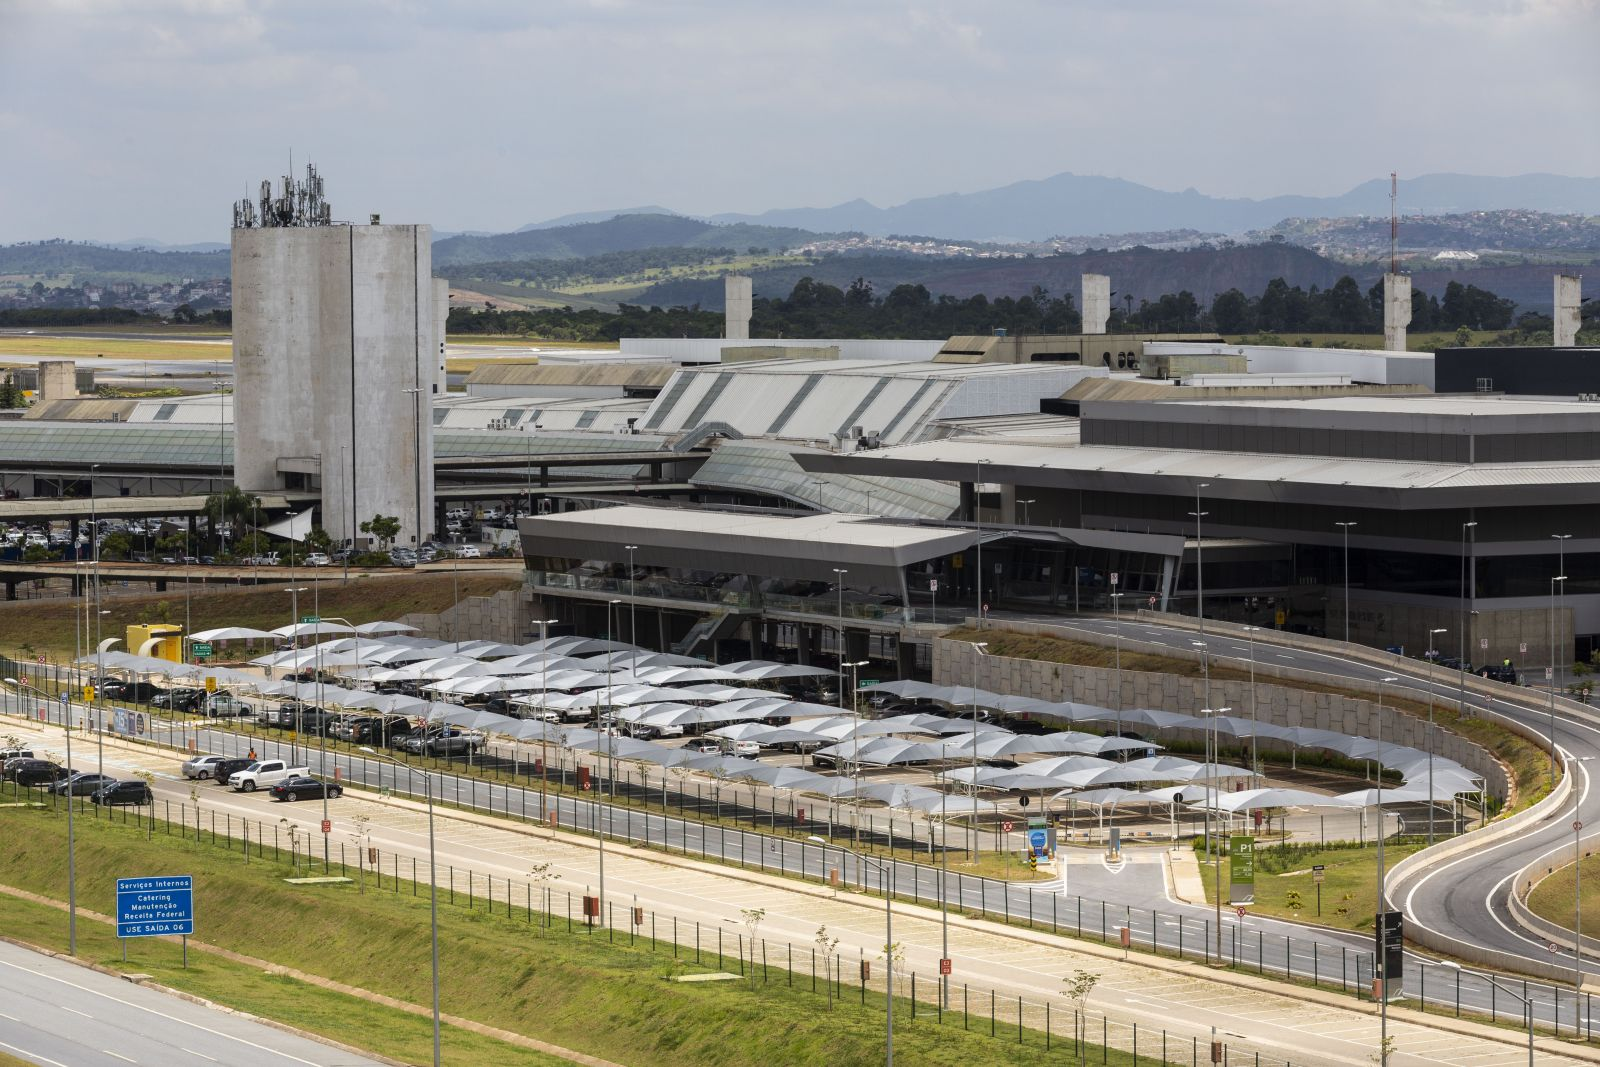 Primeiro Aeroporto Industrial do país será inaugurado amanhã no Aeroporto Internacional de BH